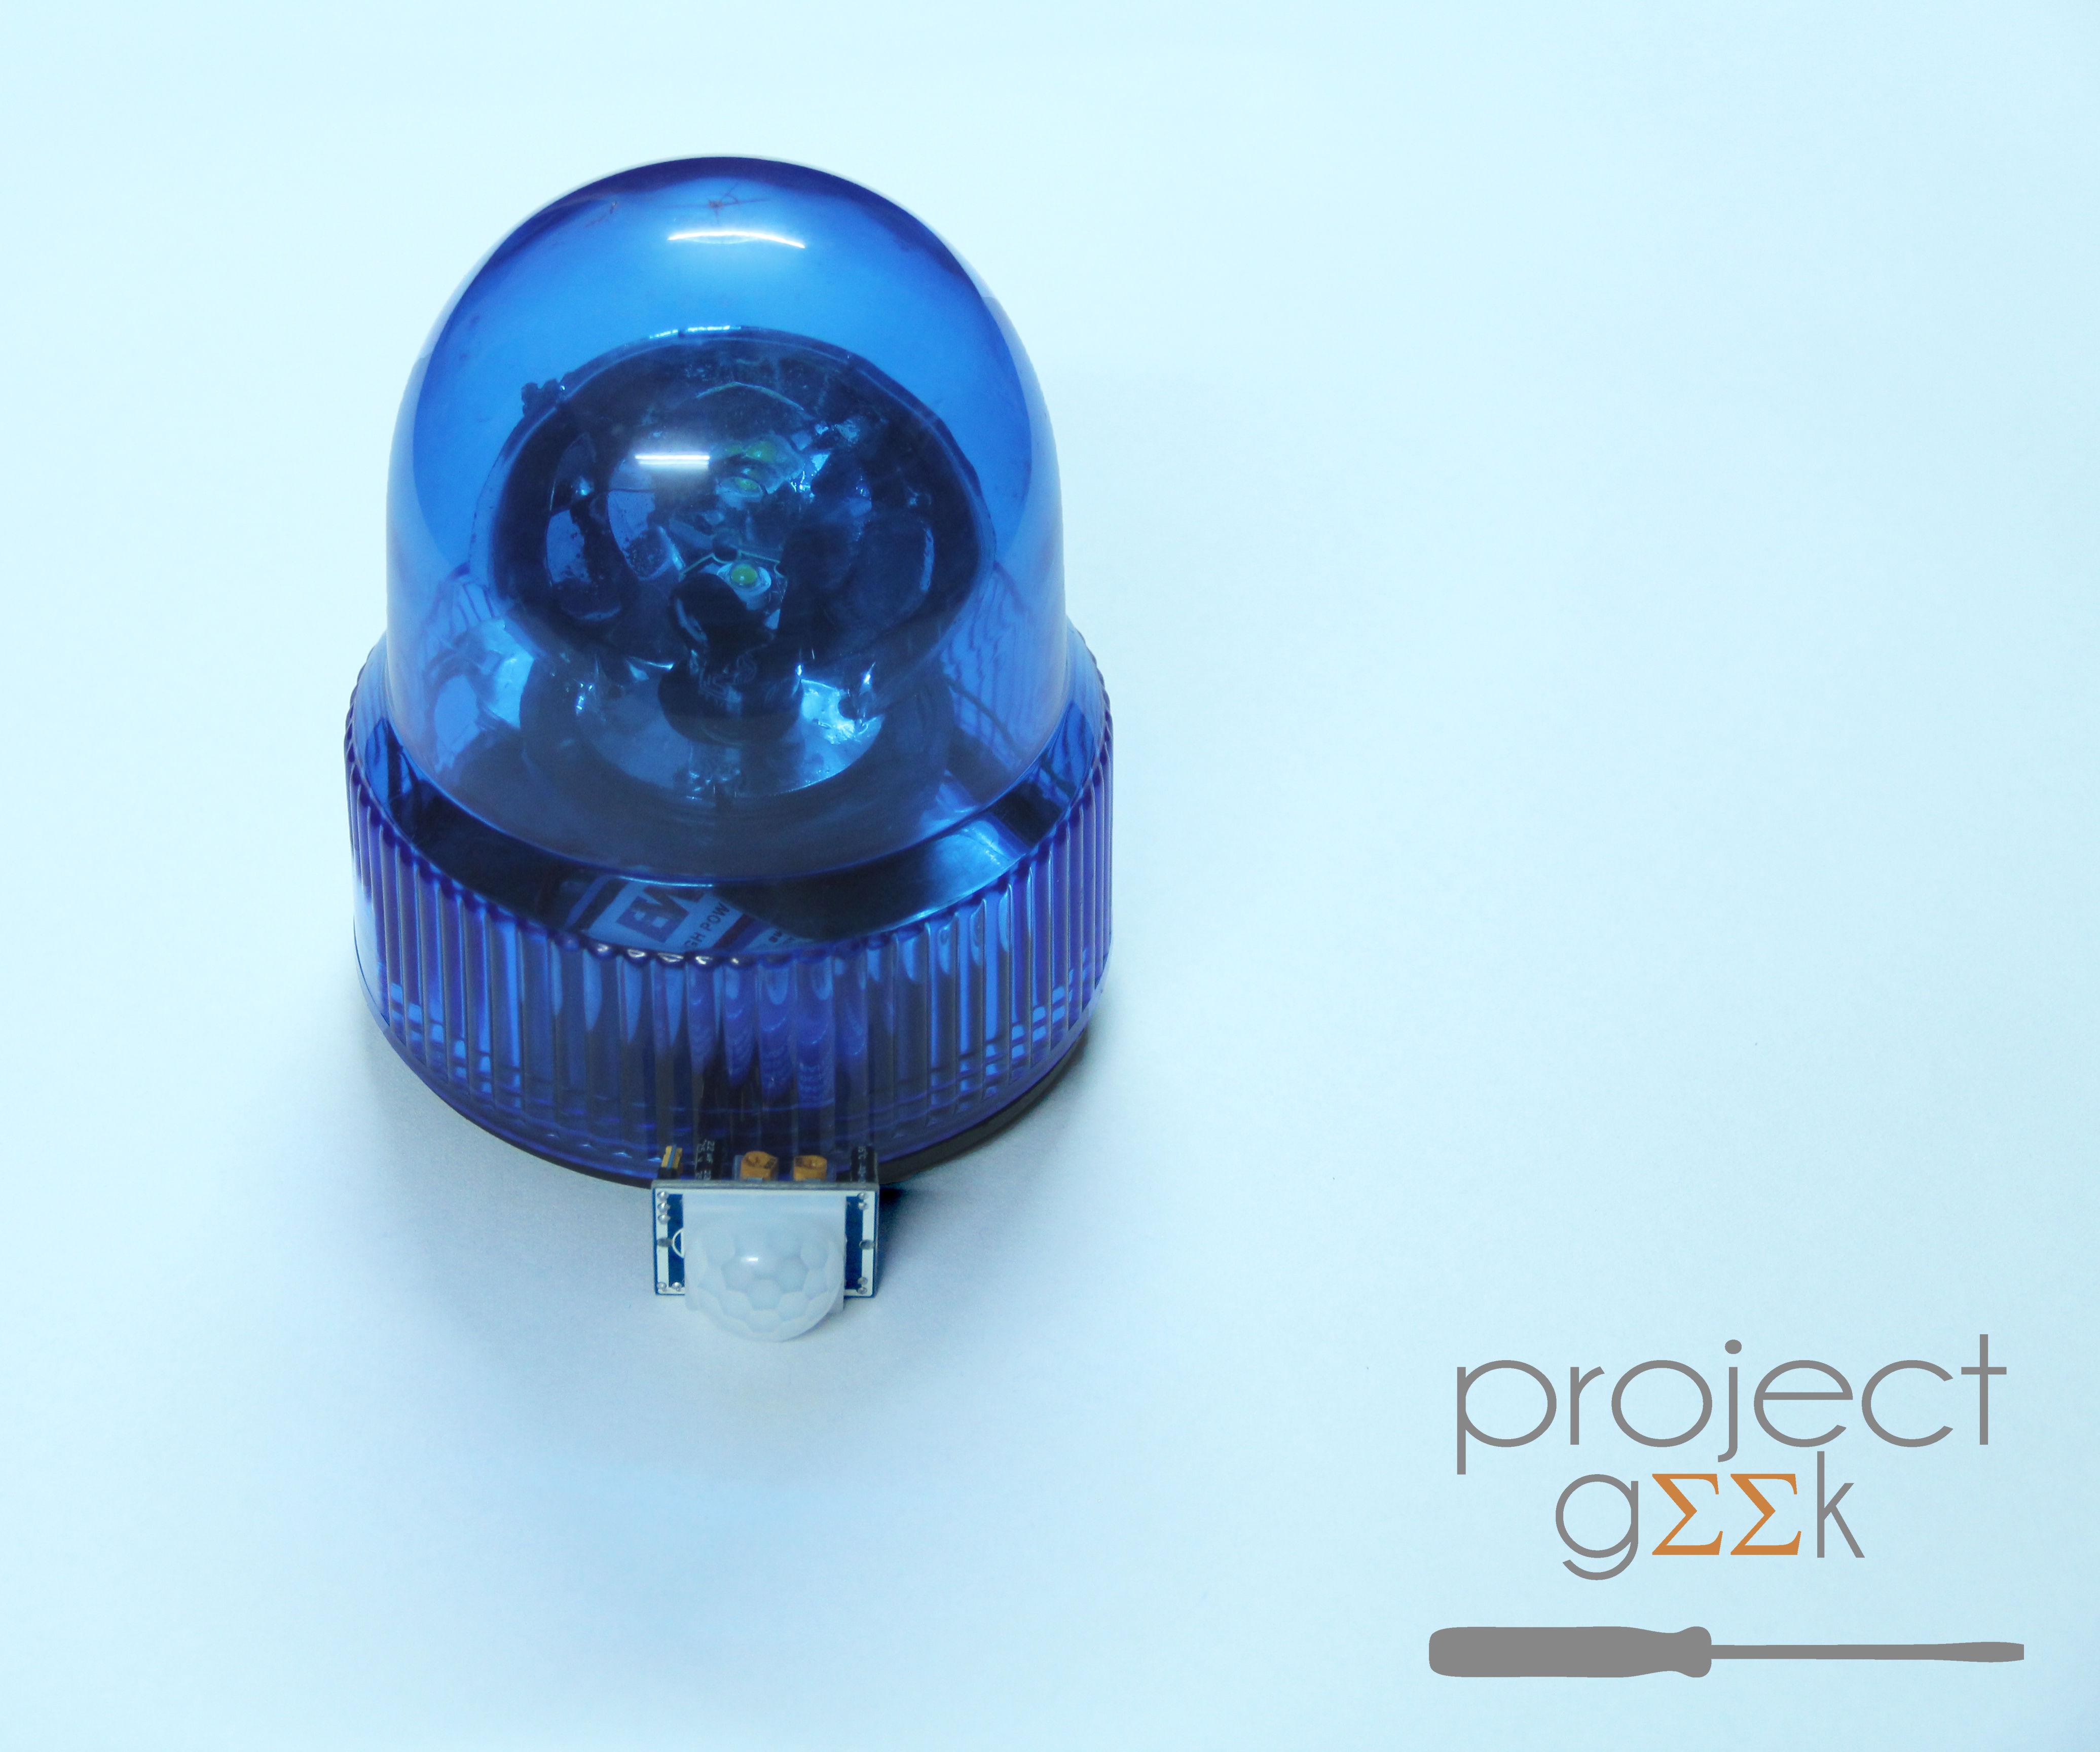 Automatic Beacon Night Light - Project Geek #3